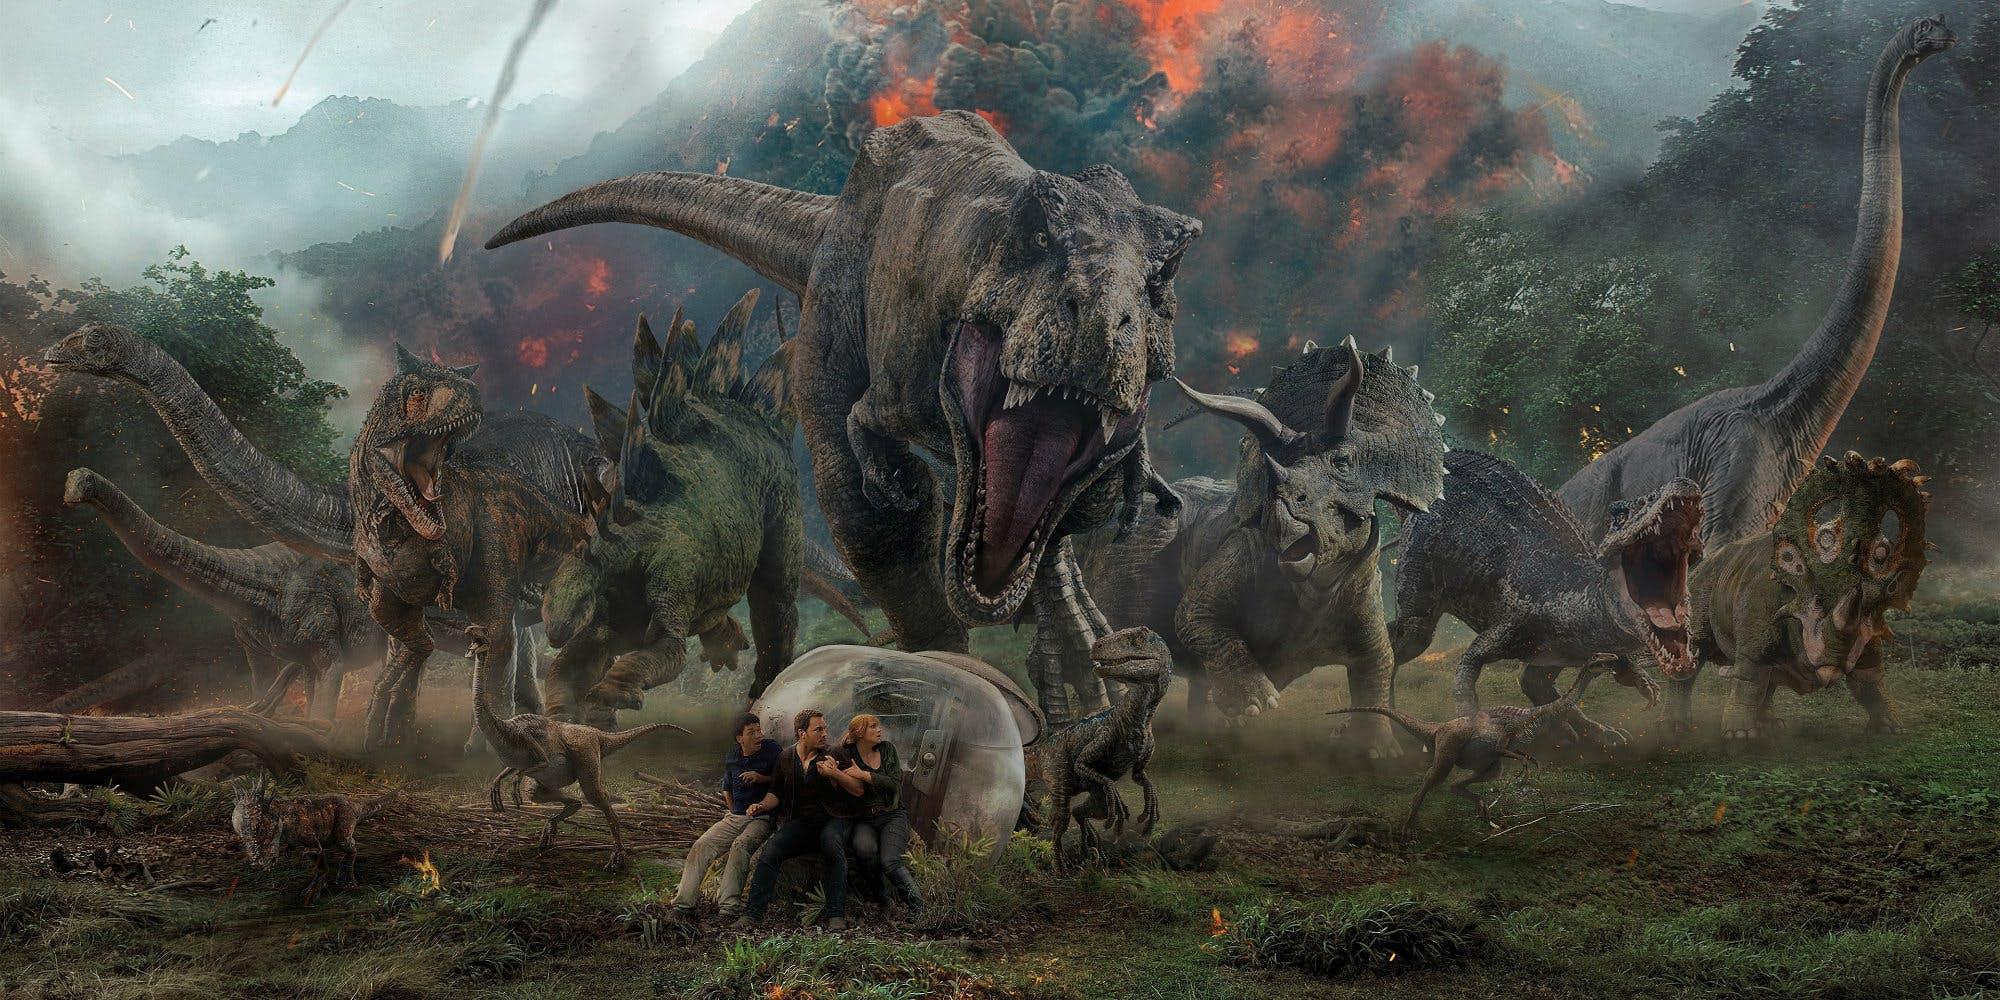 Jurassic World GlГјcksrad Trick